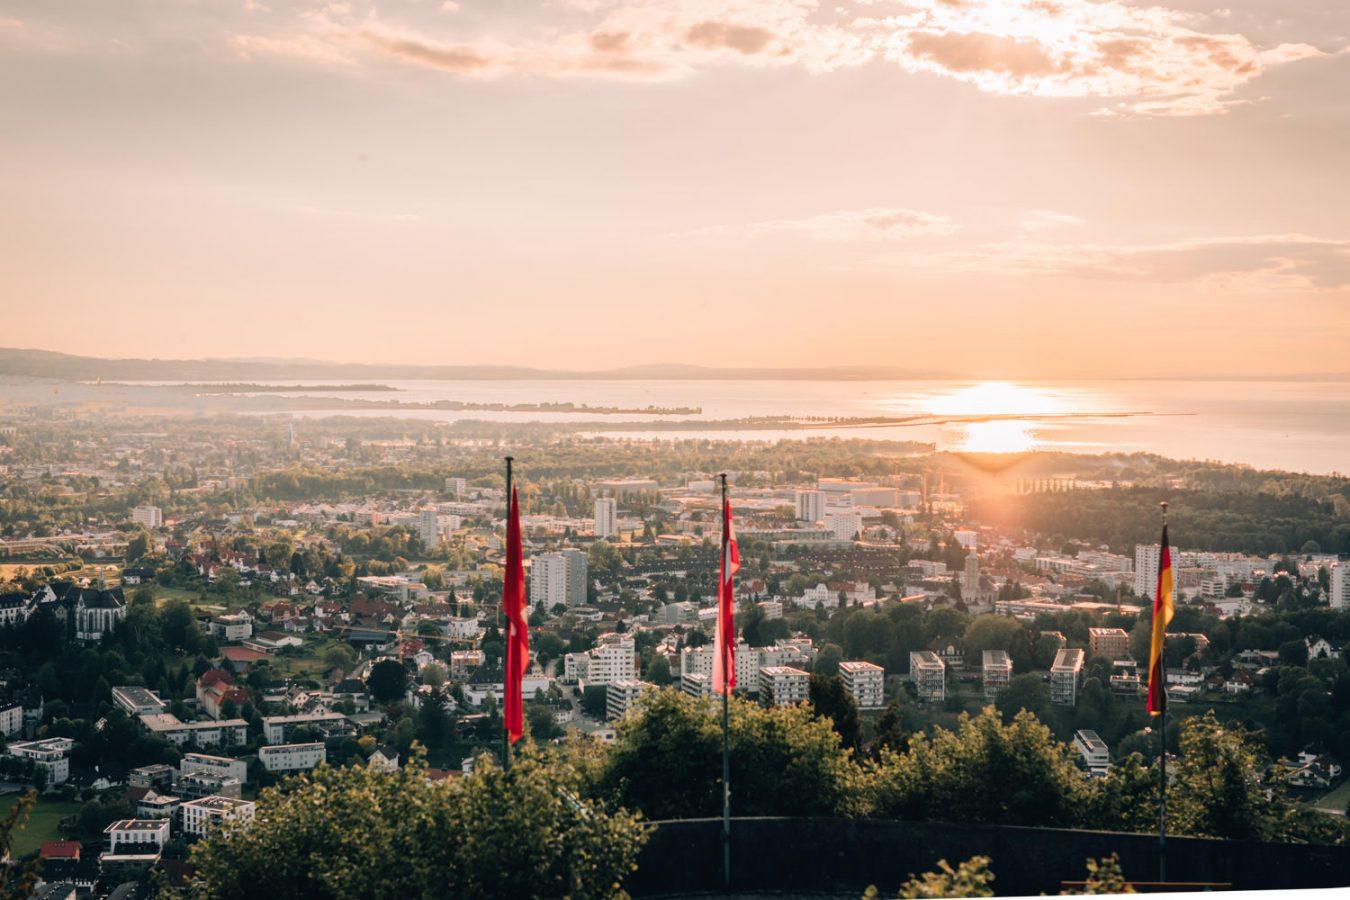 St. Gebhardsberg Panorama Sonnenuntergang